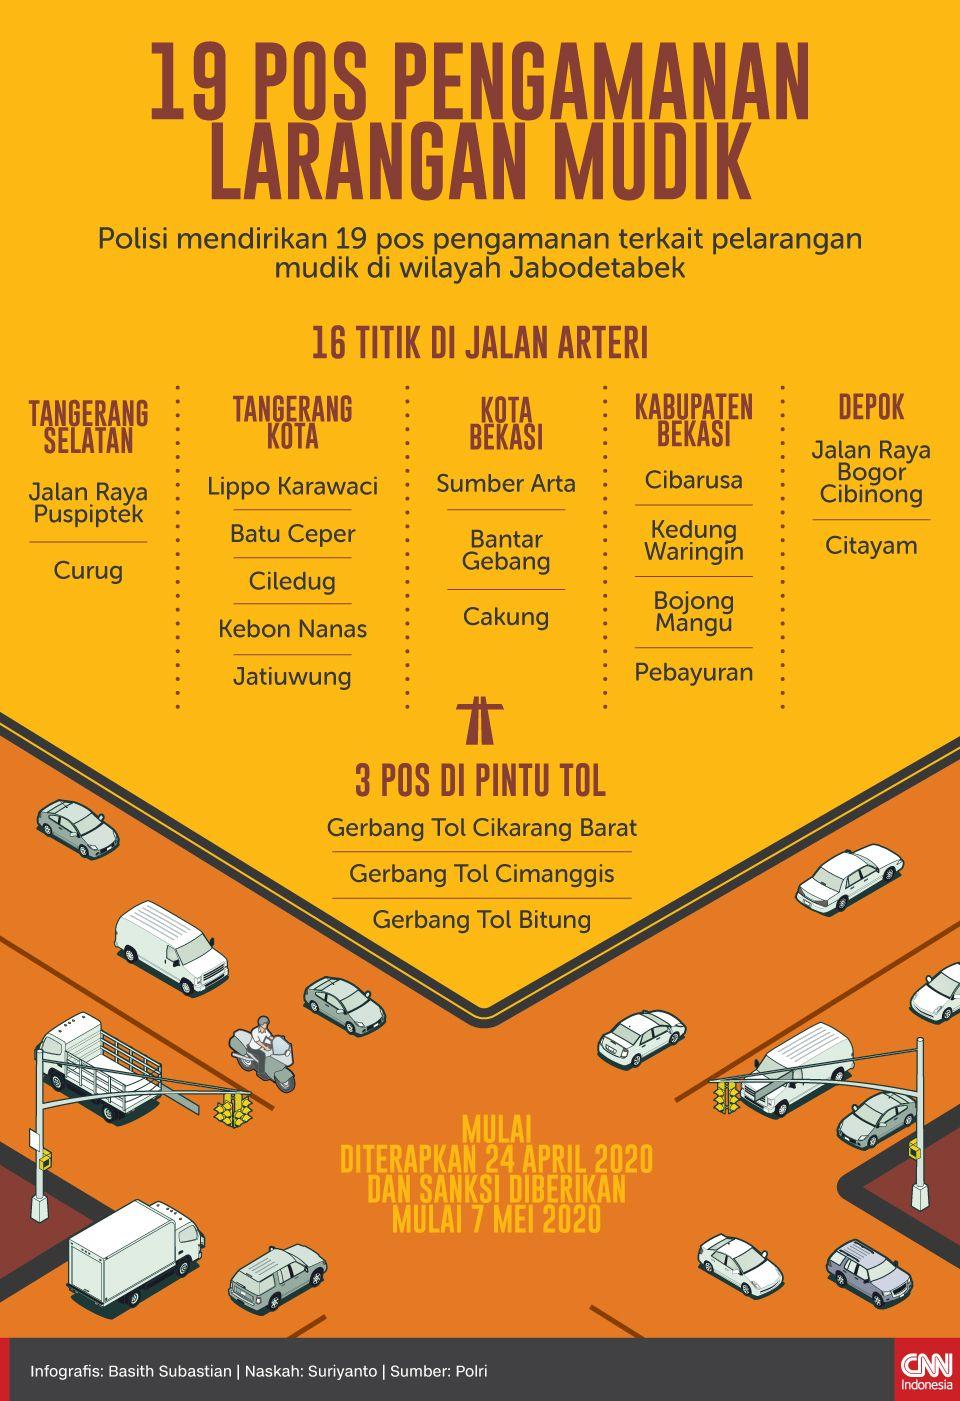 Tak Ada Pencegatan Mudik dari Bogor Hingga Jakarta Timur